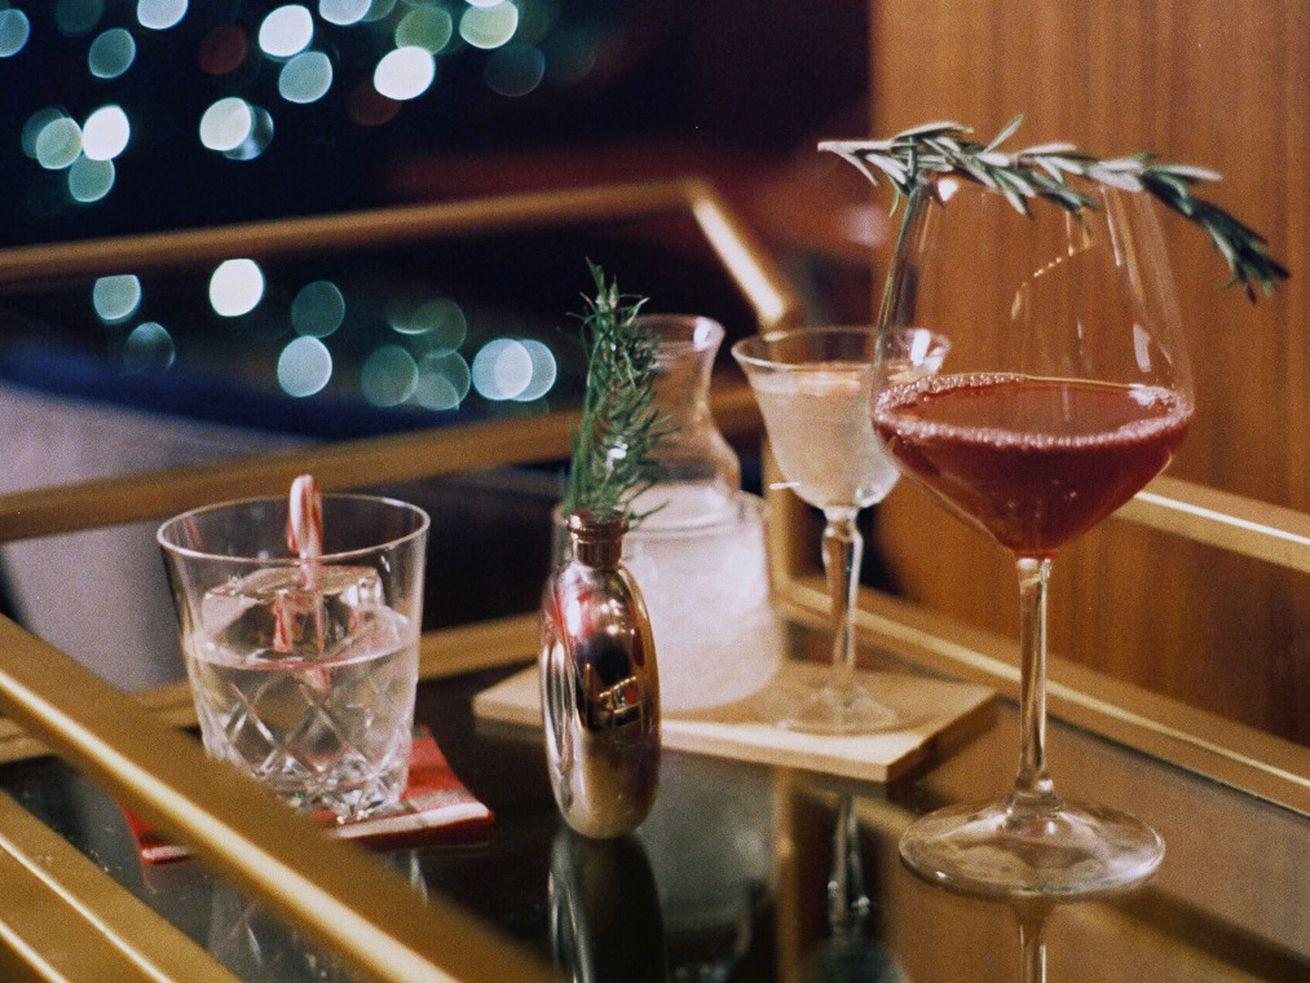 Walker Inn's Scoundrel cocktails